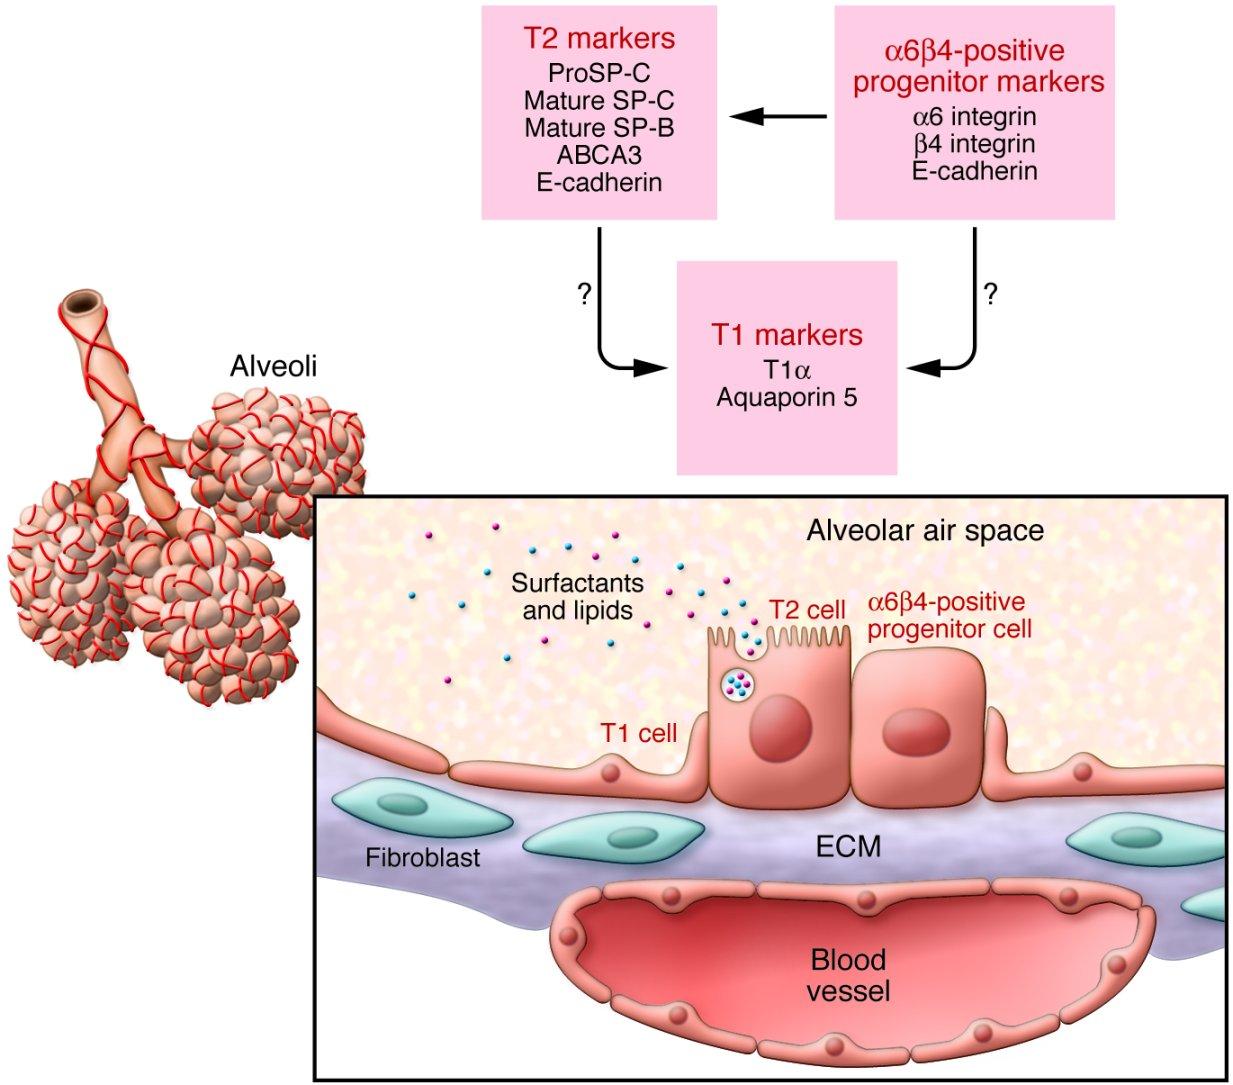 Clara Cell Diagram Schematics Wiring Diagrams Plant Labeled Free Download Schematic Anti Fibrosis June 2011 Alveolar Human